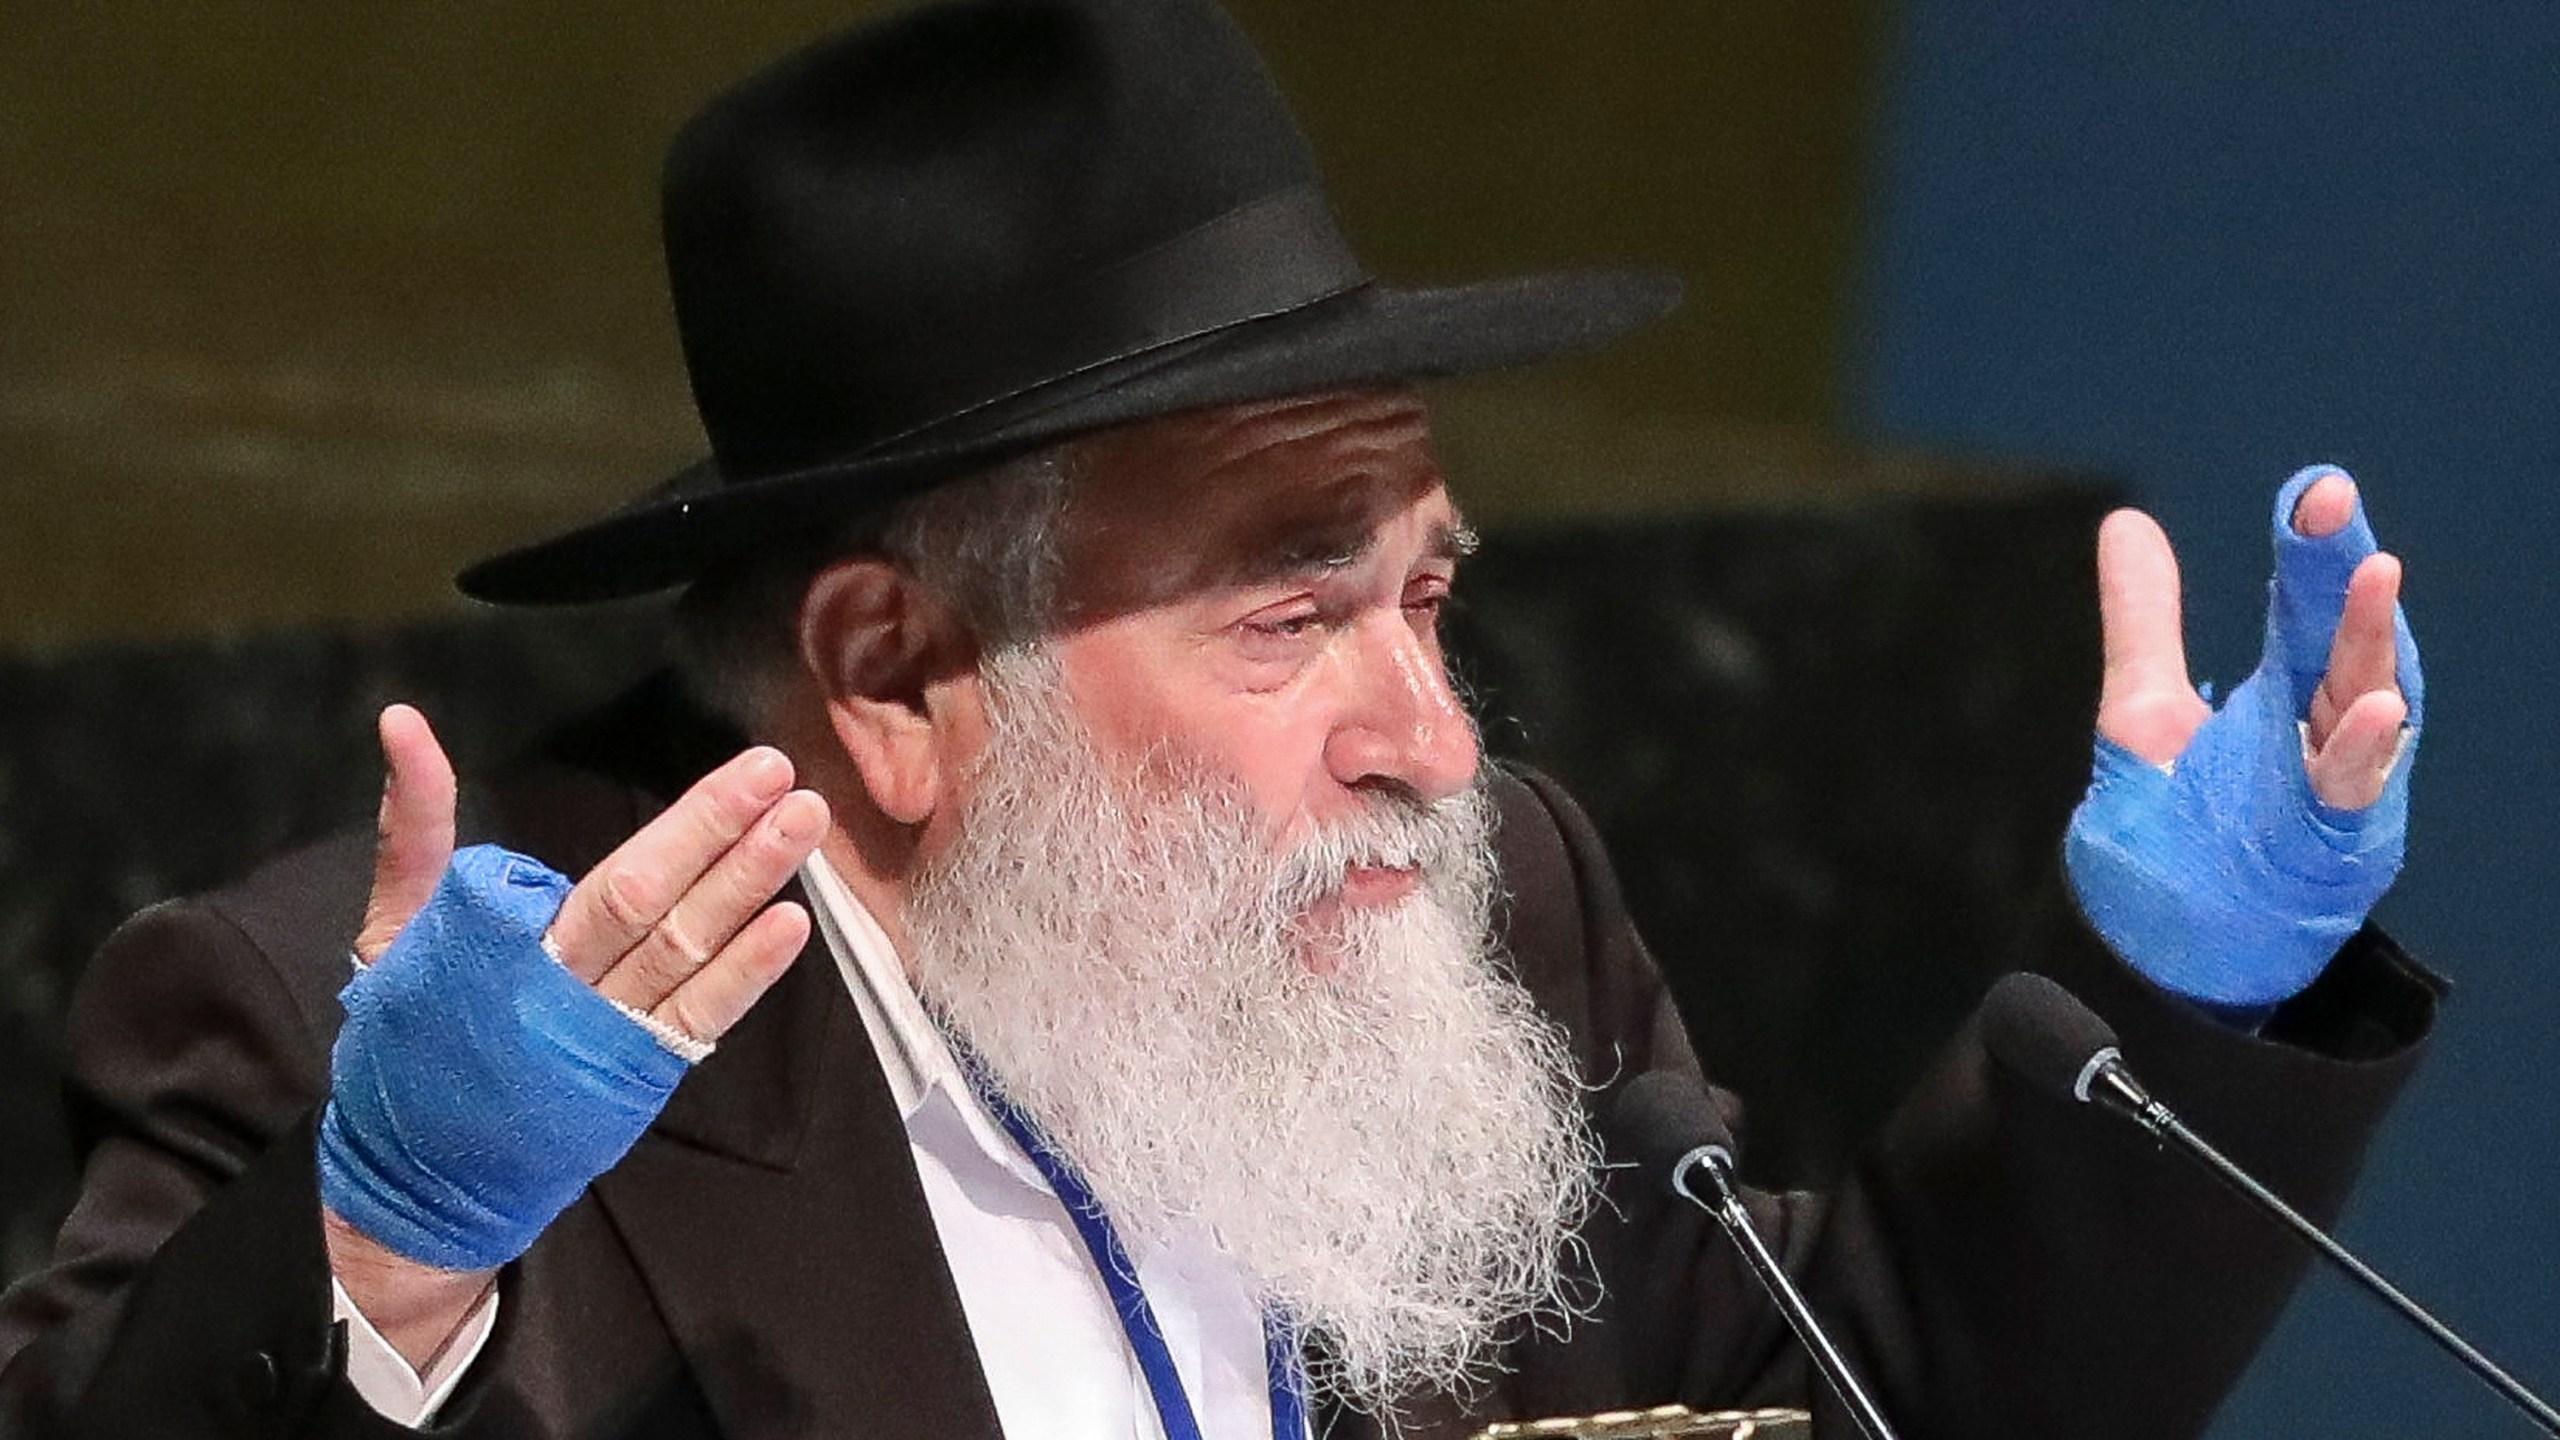 Yisroel Goldstein